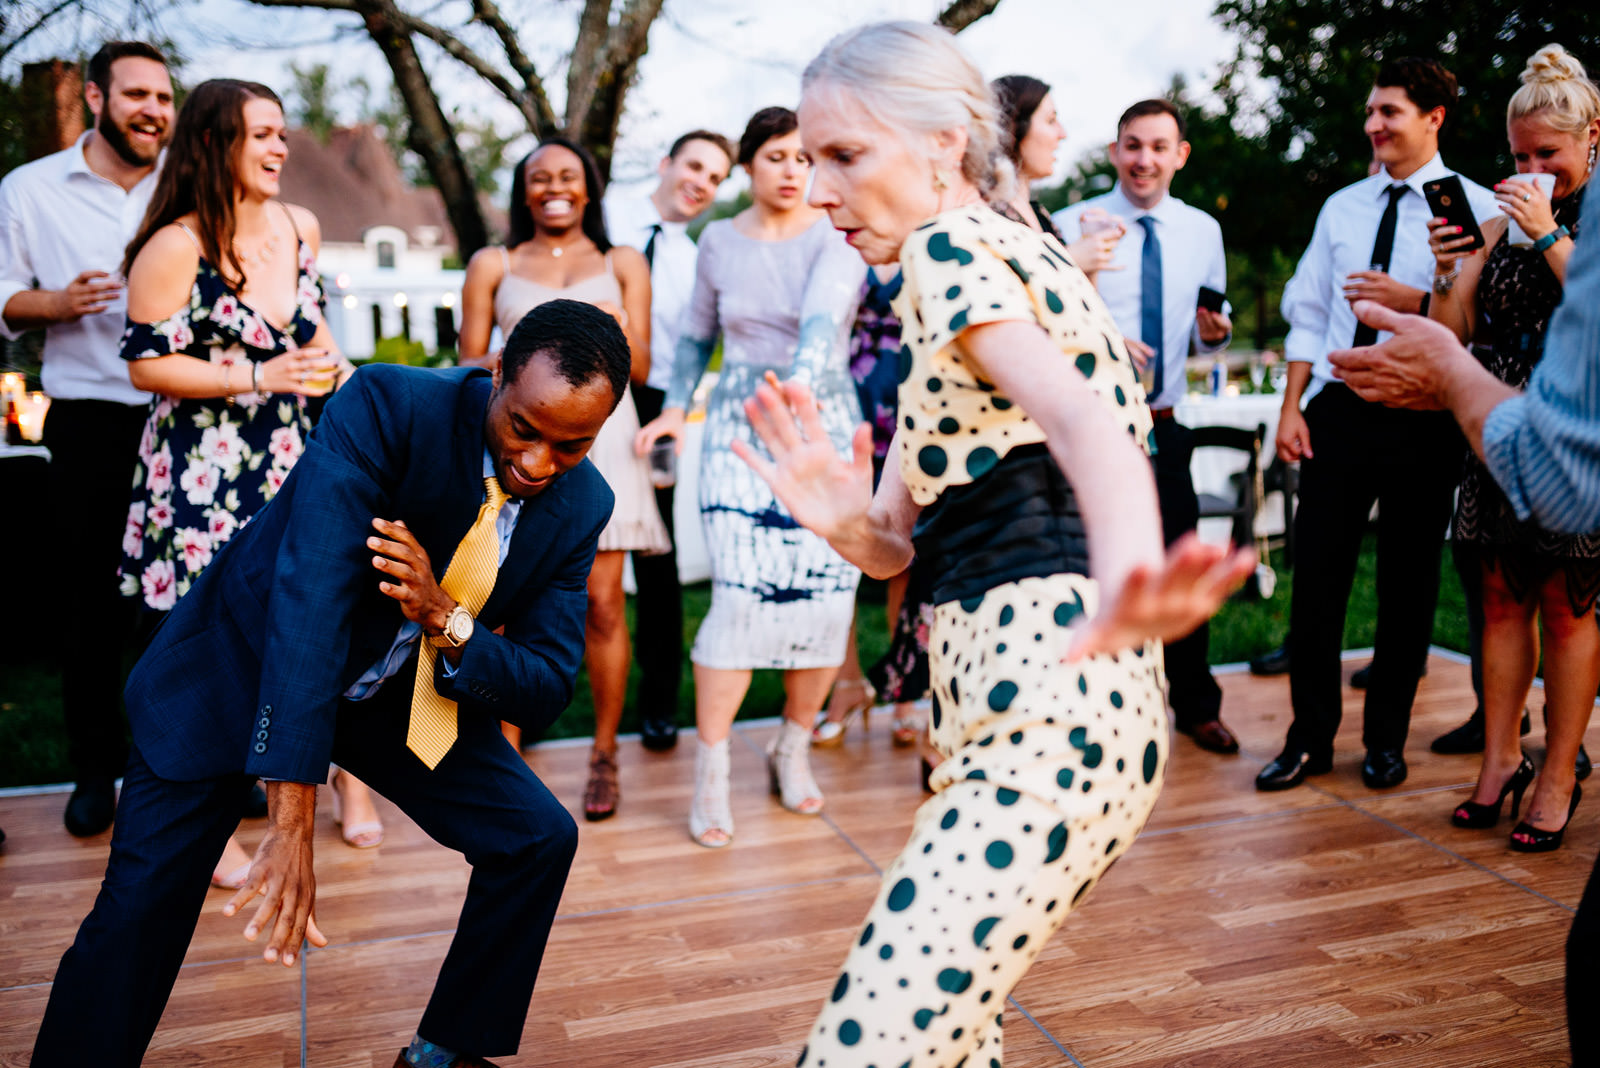 guests dancing during outdoor wedding reception